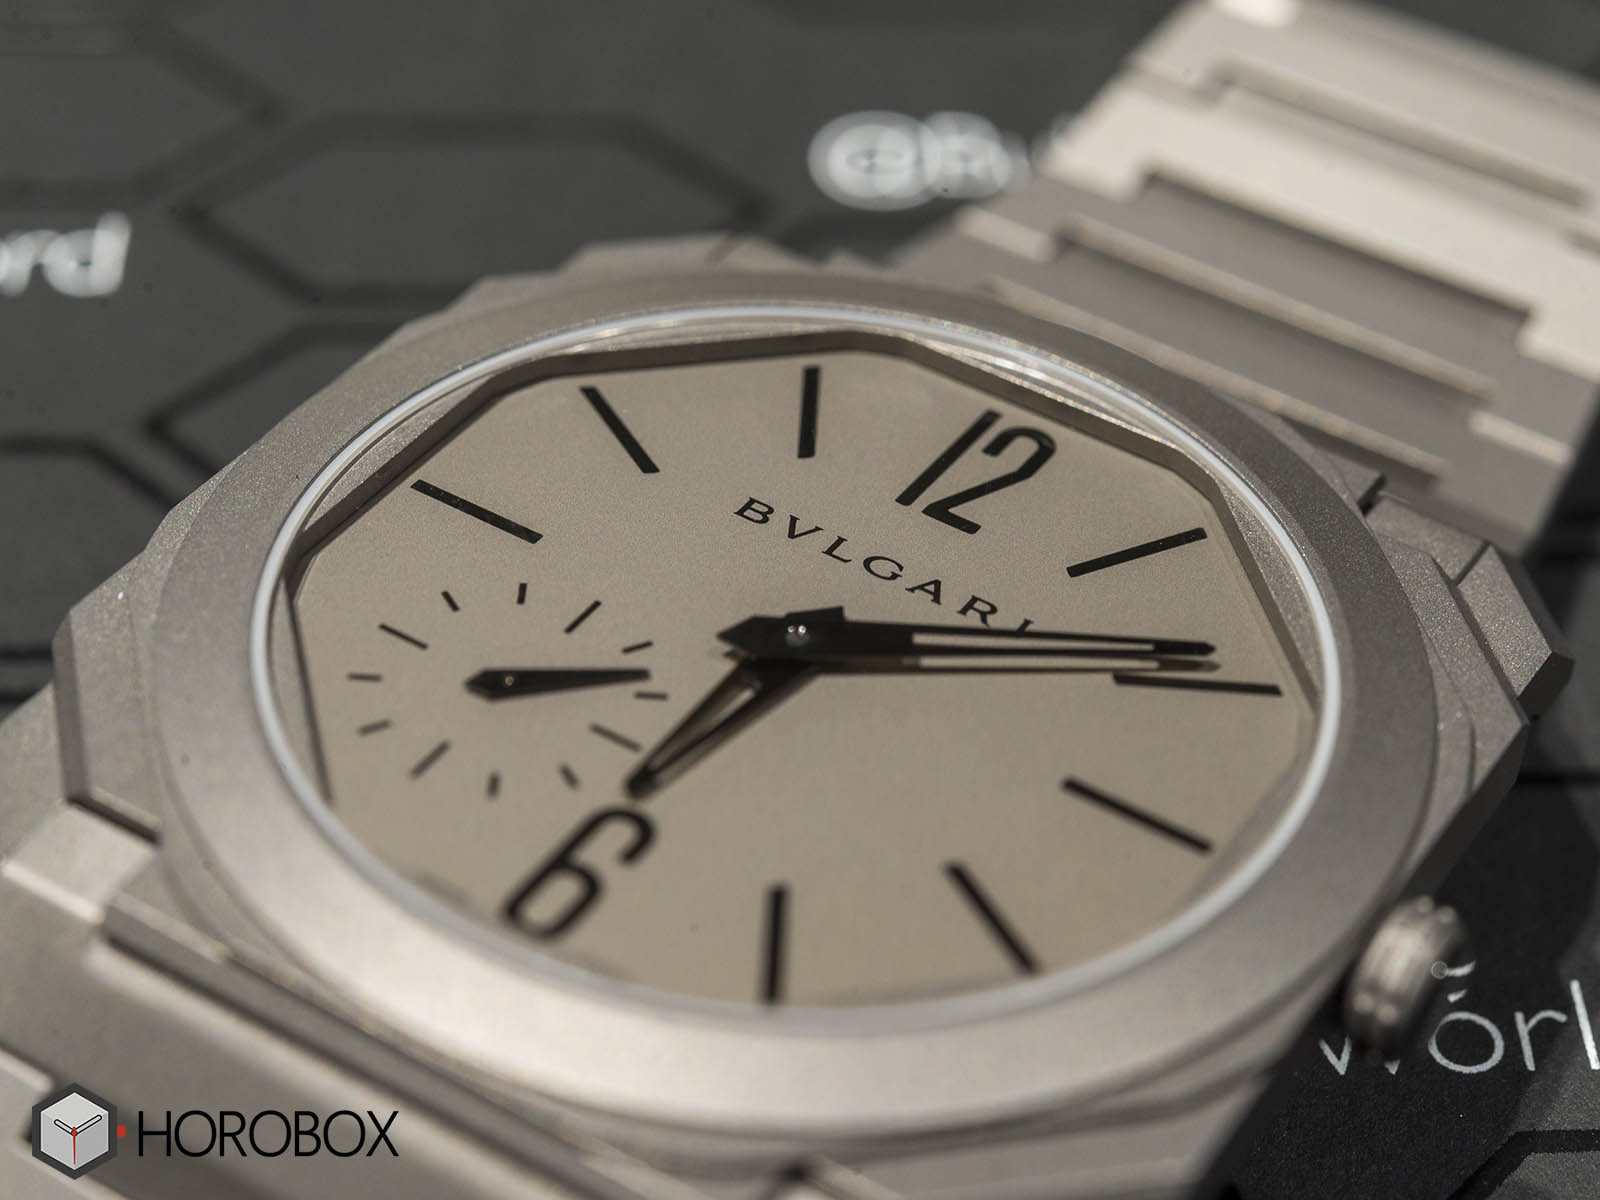 Bulgari-Octo-Finissimo-automatic-5.jpg